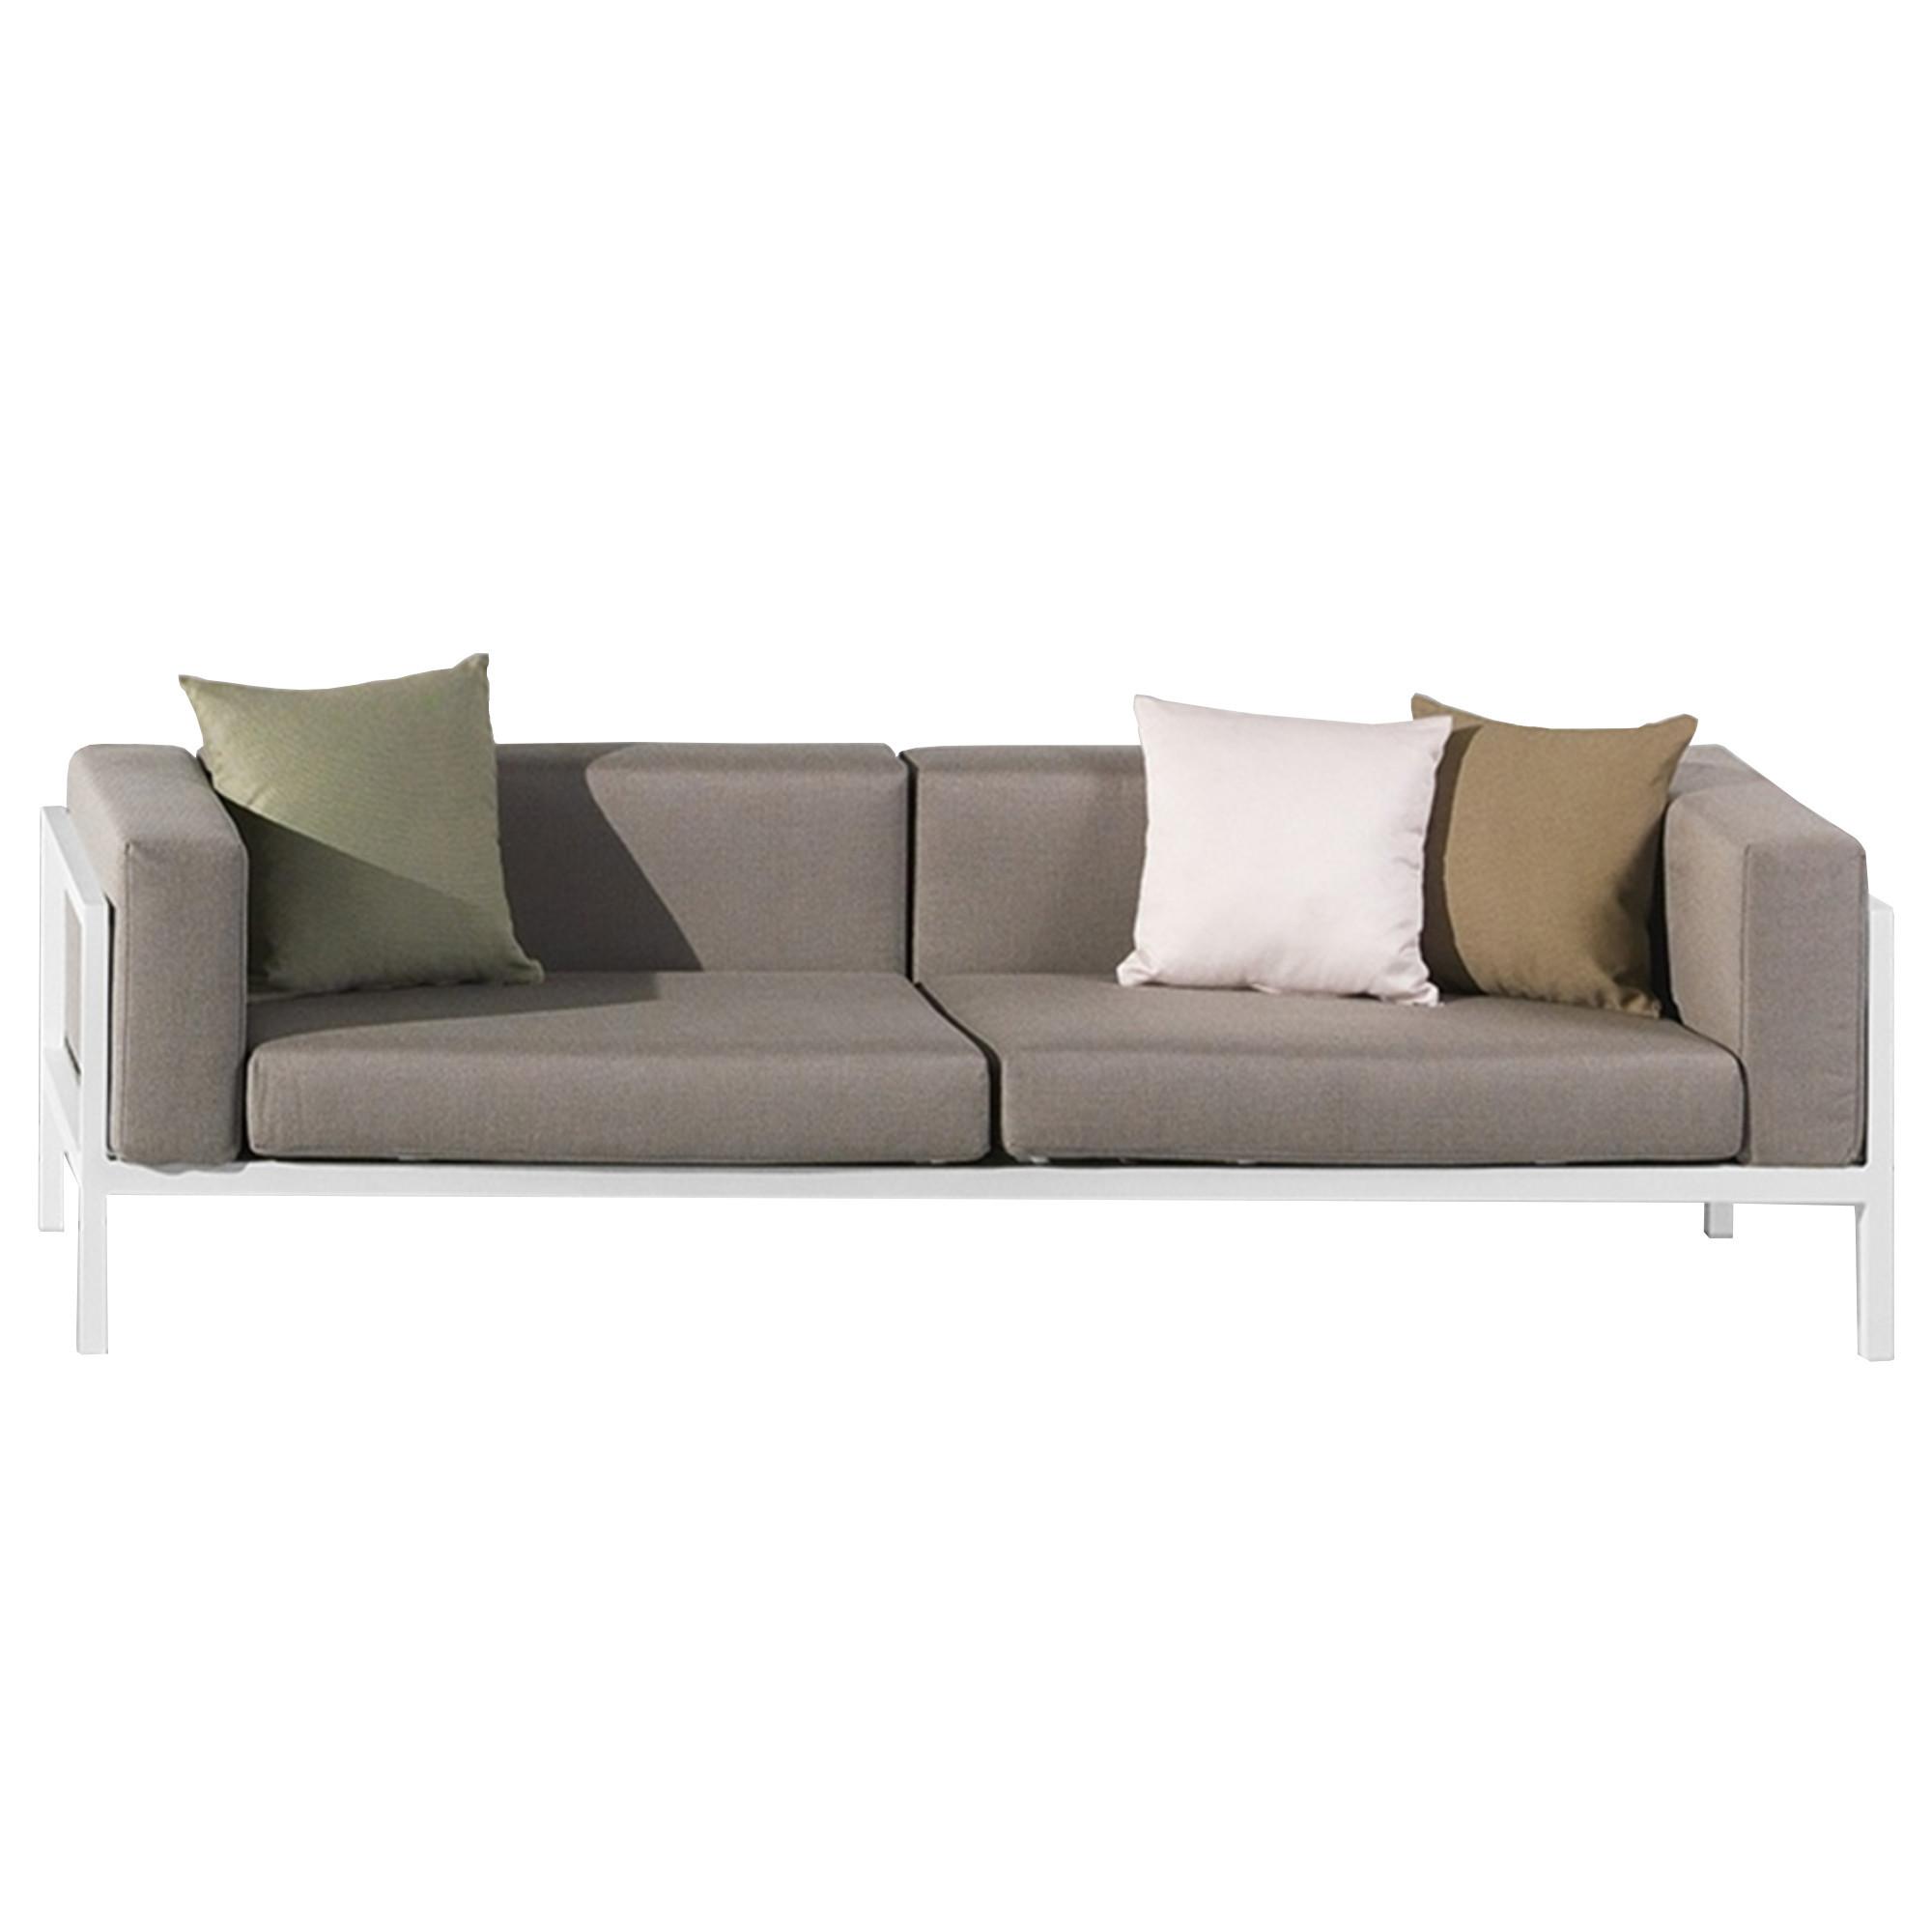 Landscape Xl Sofa